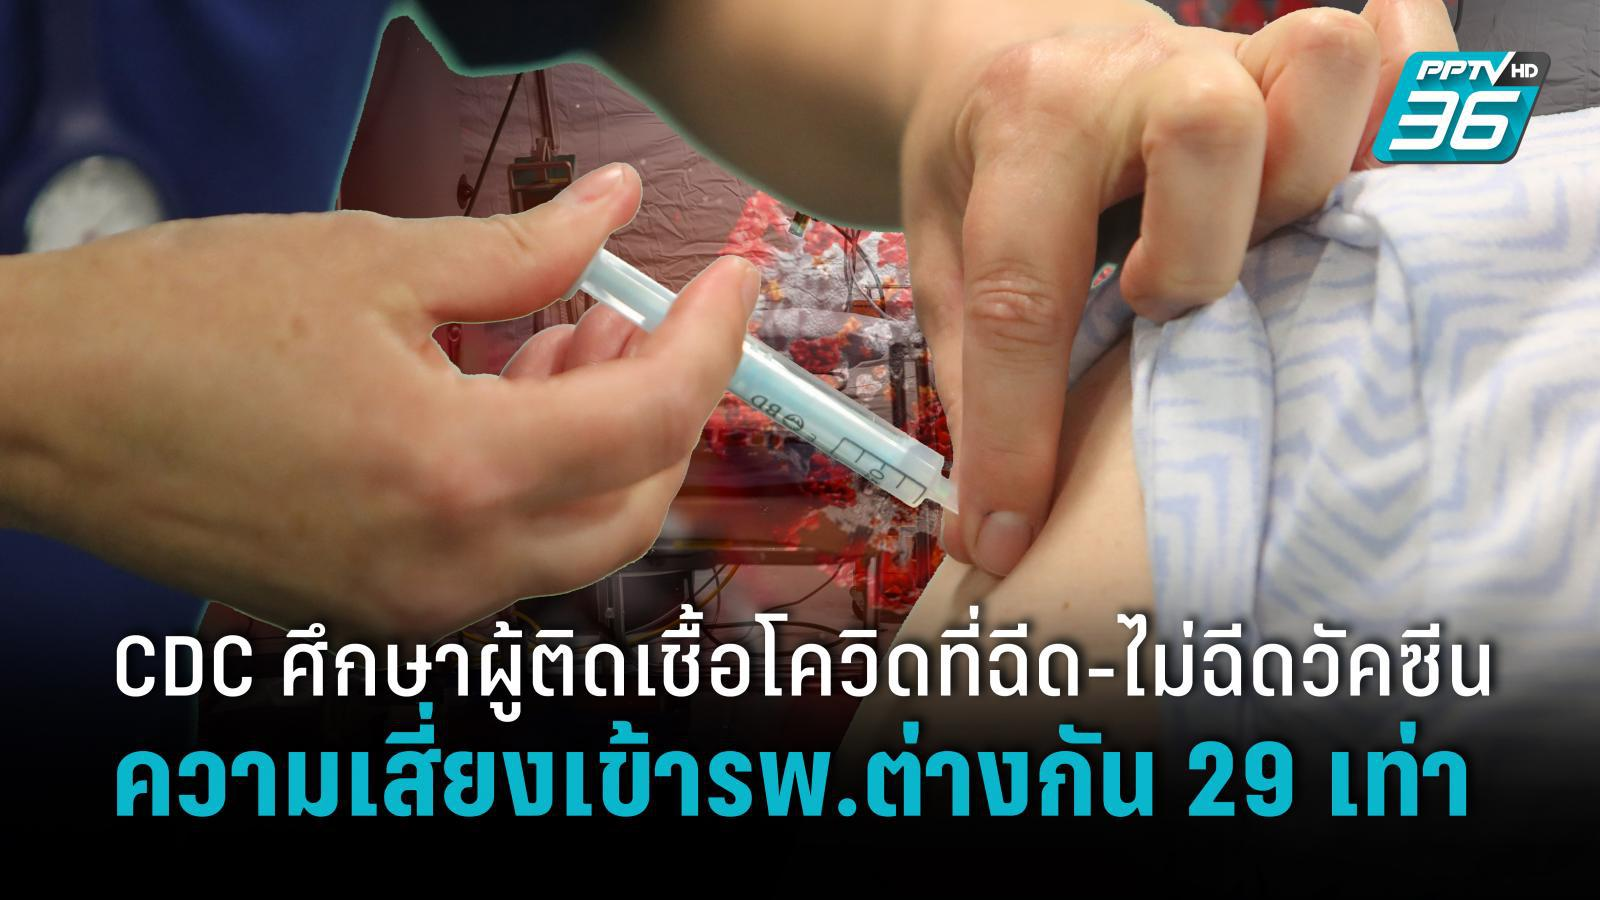 CDC เผย ไม่ฉีดวัคซีนโควิด-19 เสี่ยงเข้าโรงพยาบาลมากกว่าคนฉีด 29 เท่า